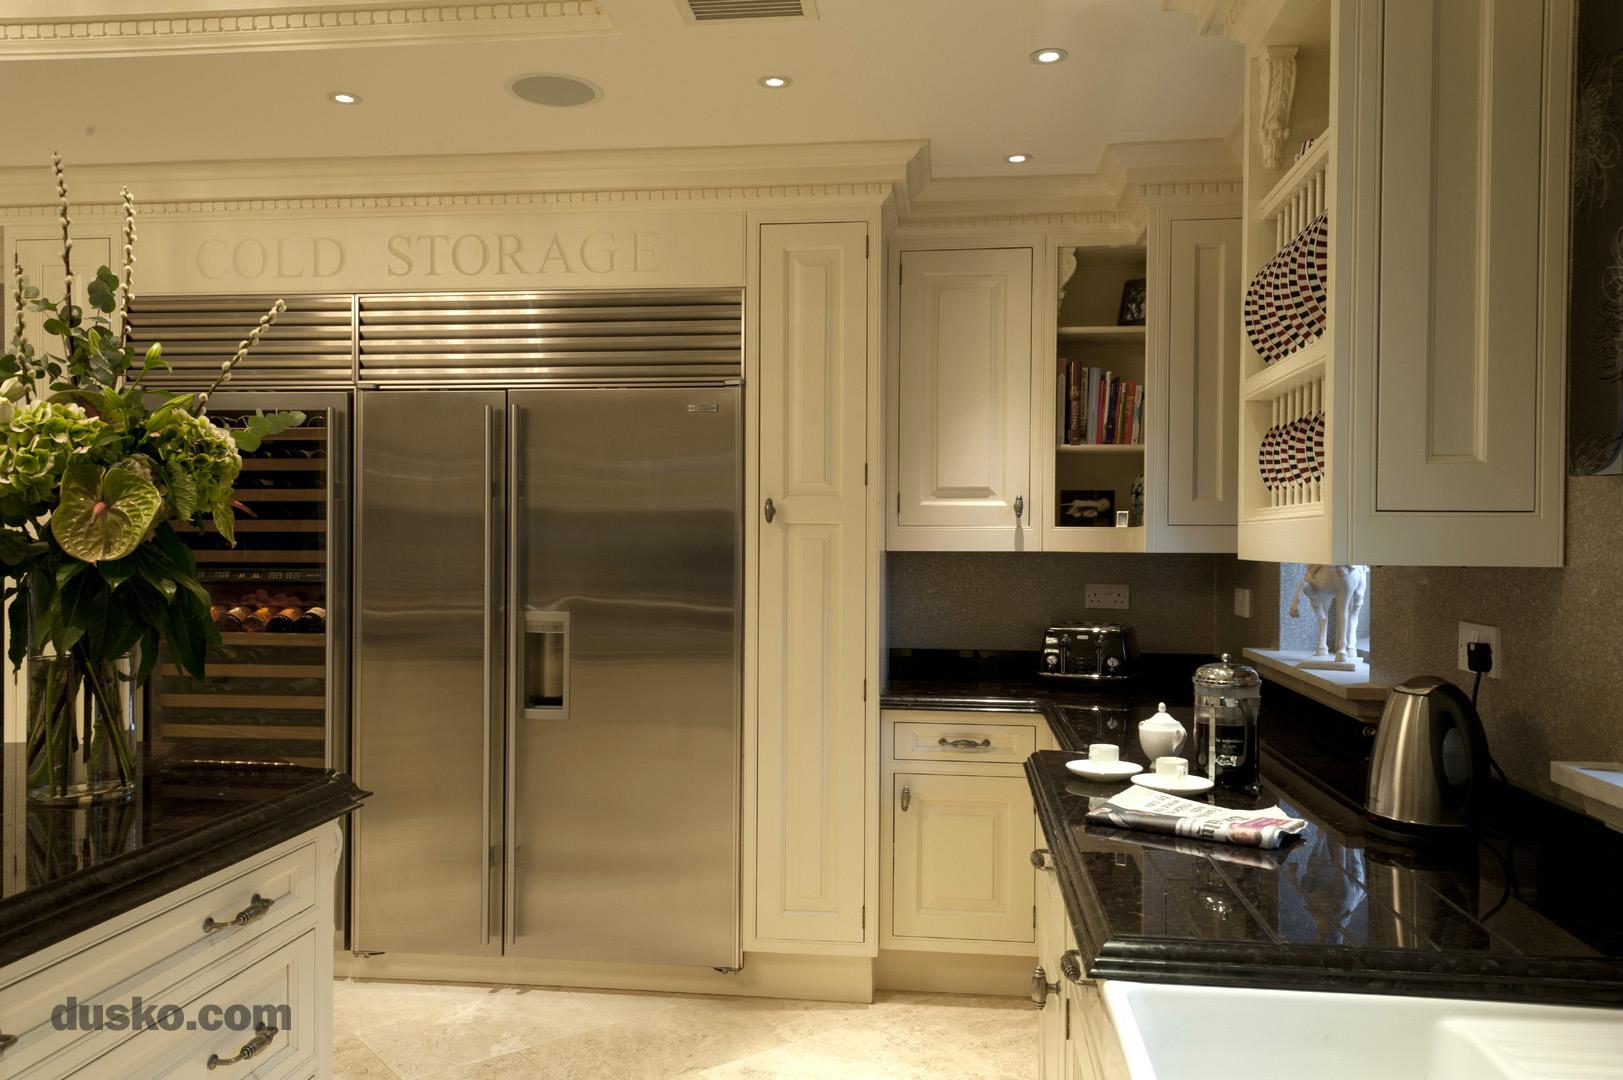 Colonial Style Kitchen in Prestbury, Cheshire Sub Zero Fridge Freezer and Wine Cooler